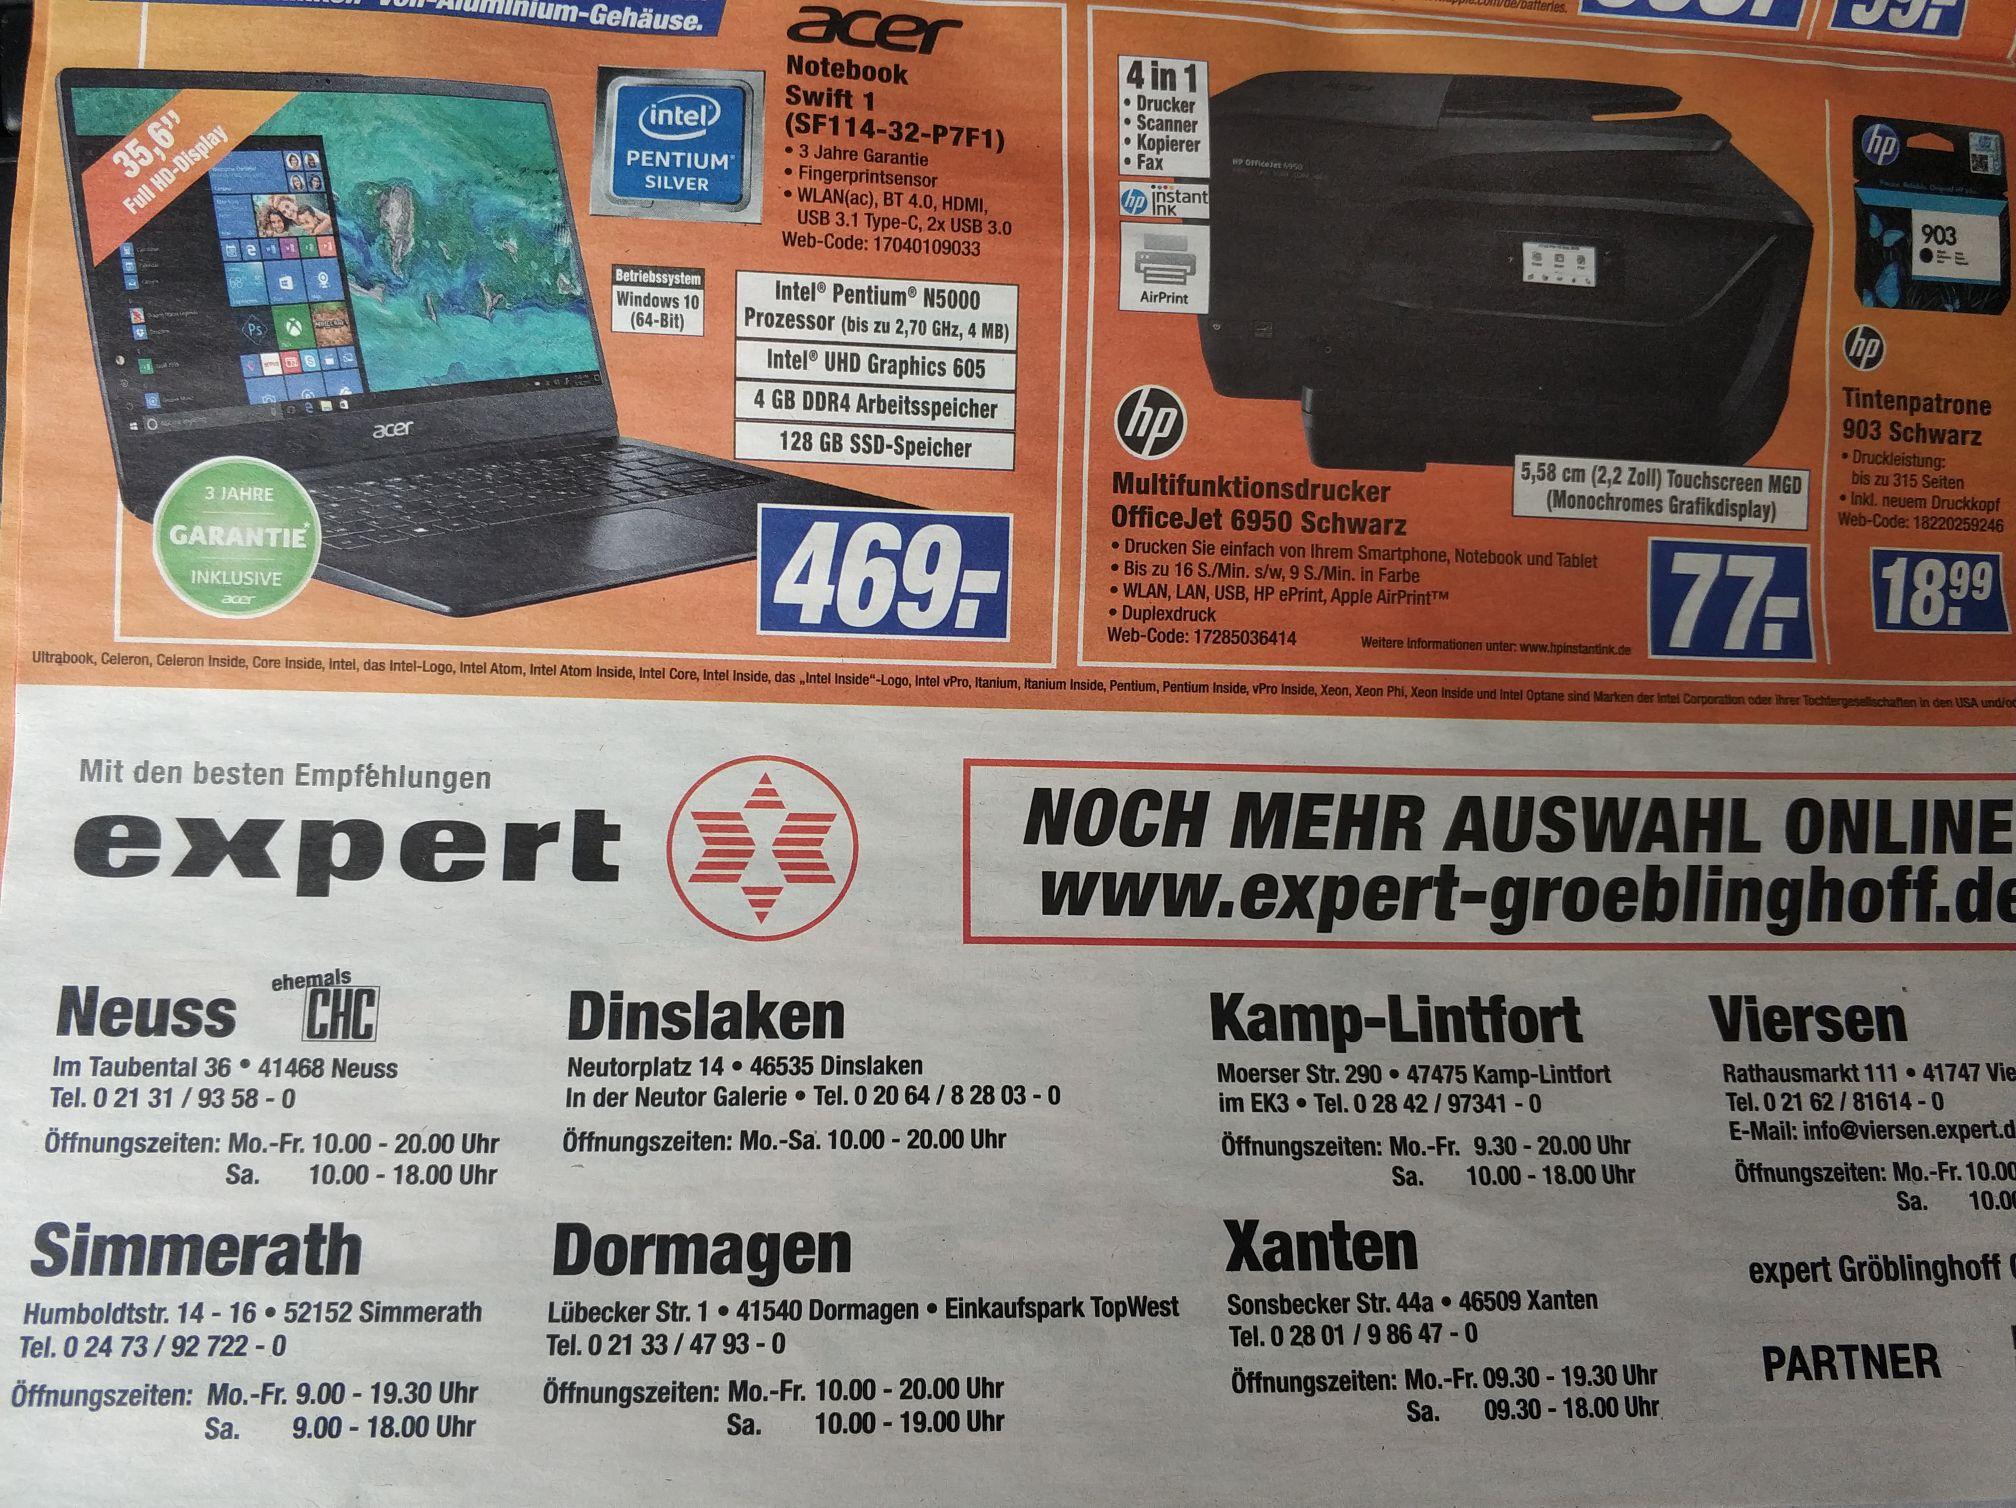 Wmf Elektrogrill Media Markt : Expert gröblinghoff wmf lono chromargan elektrogrill mydealz